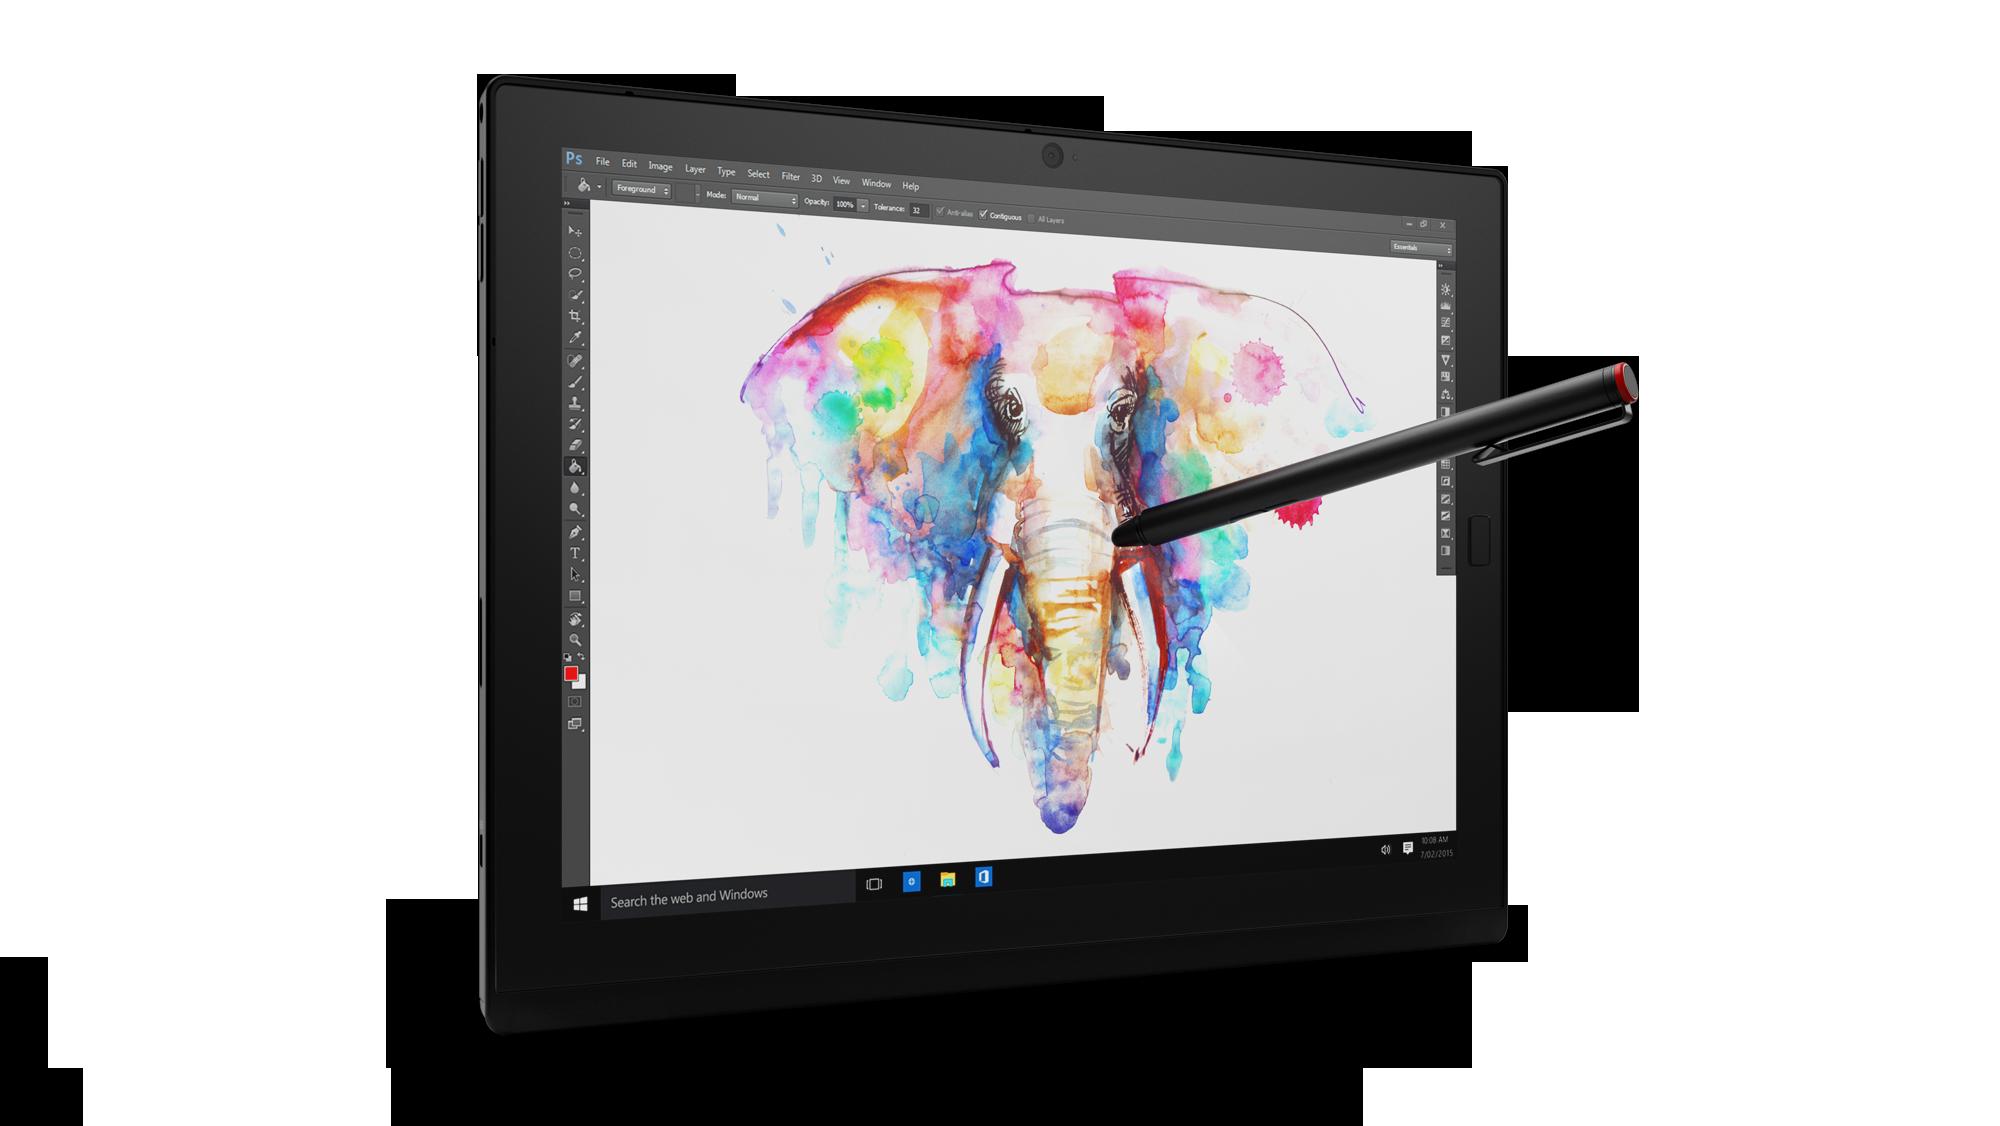 26_X1_Tablet_USB_Pen_Hero_Shot.png